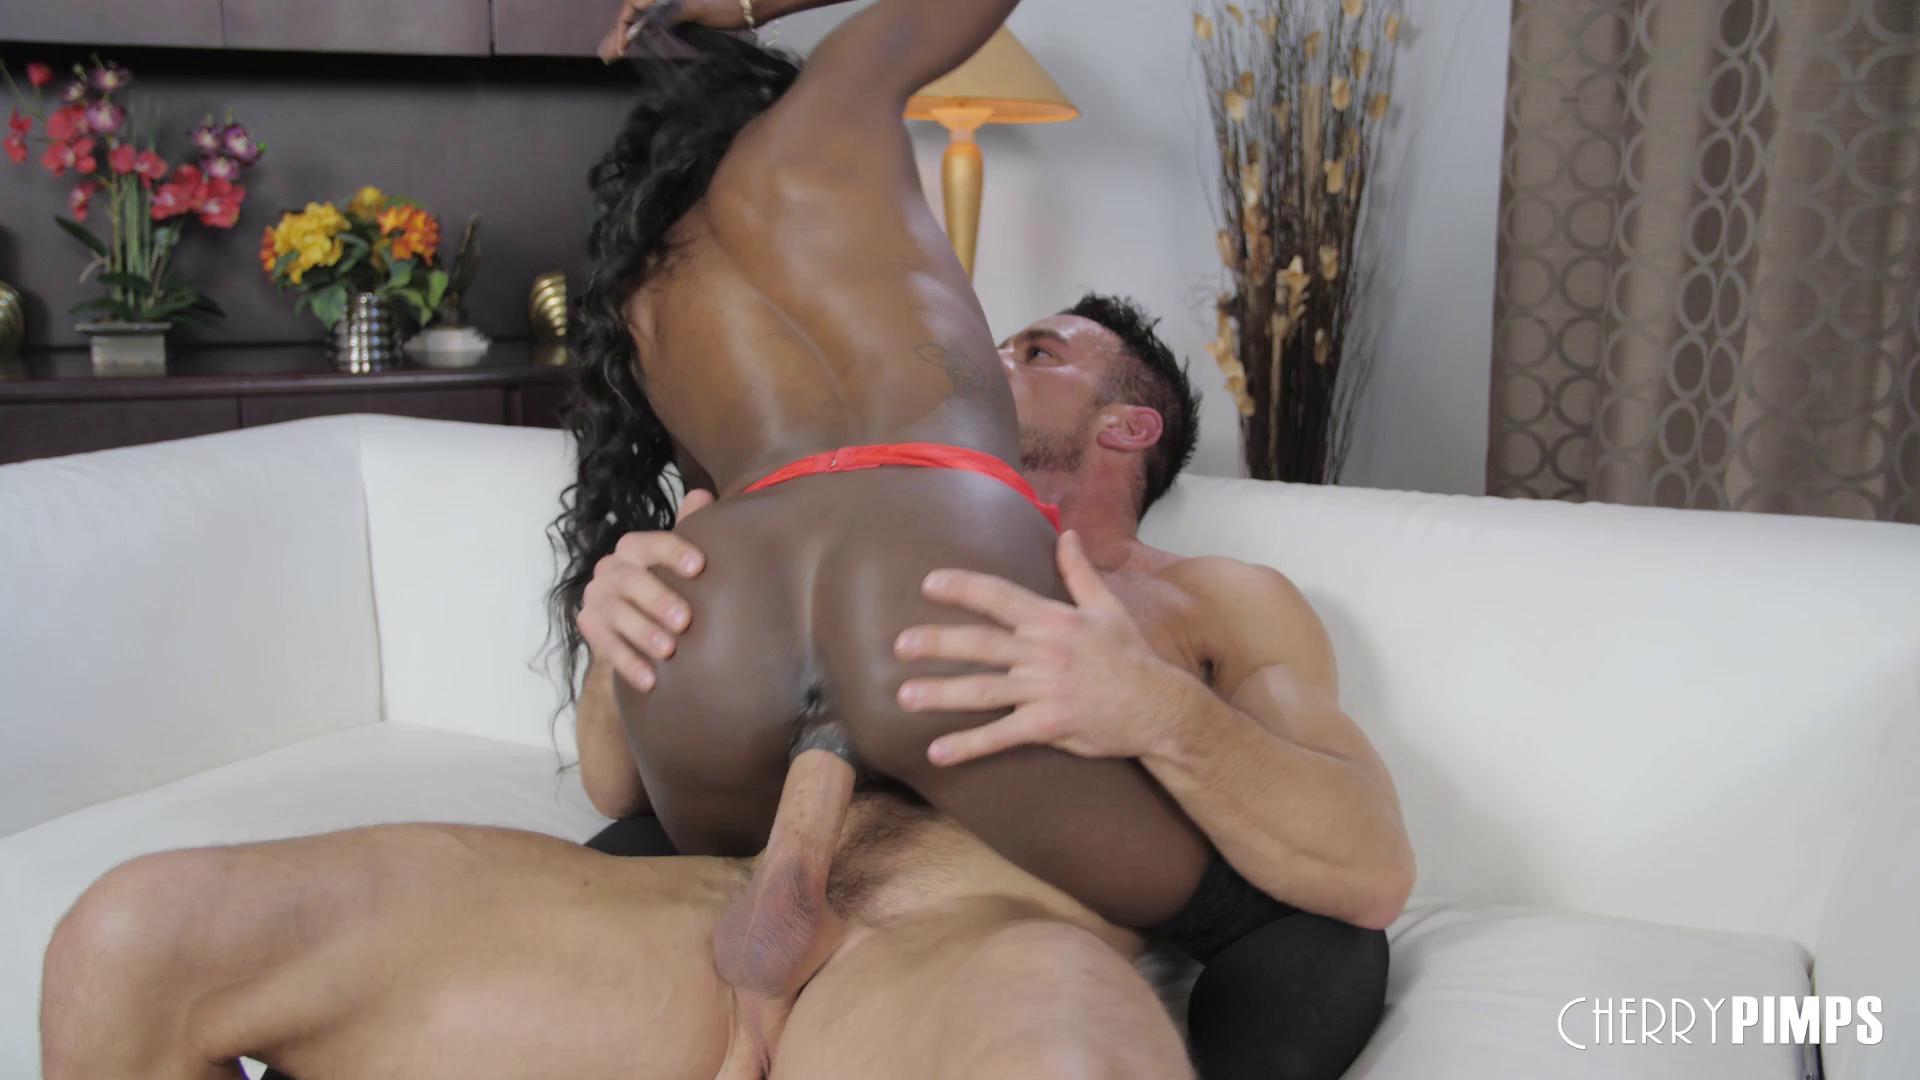 Ana Foxxx Gives John One Sexy Surprise